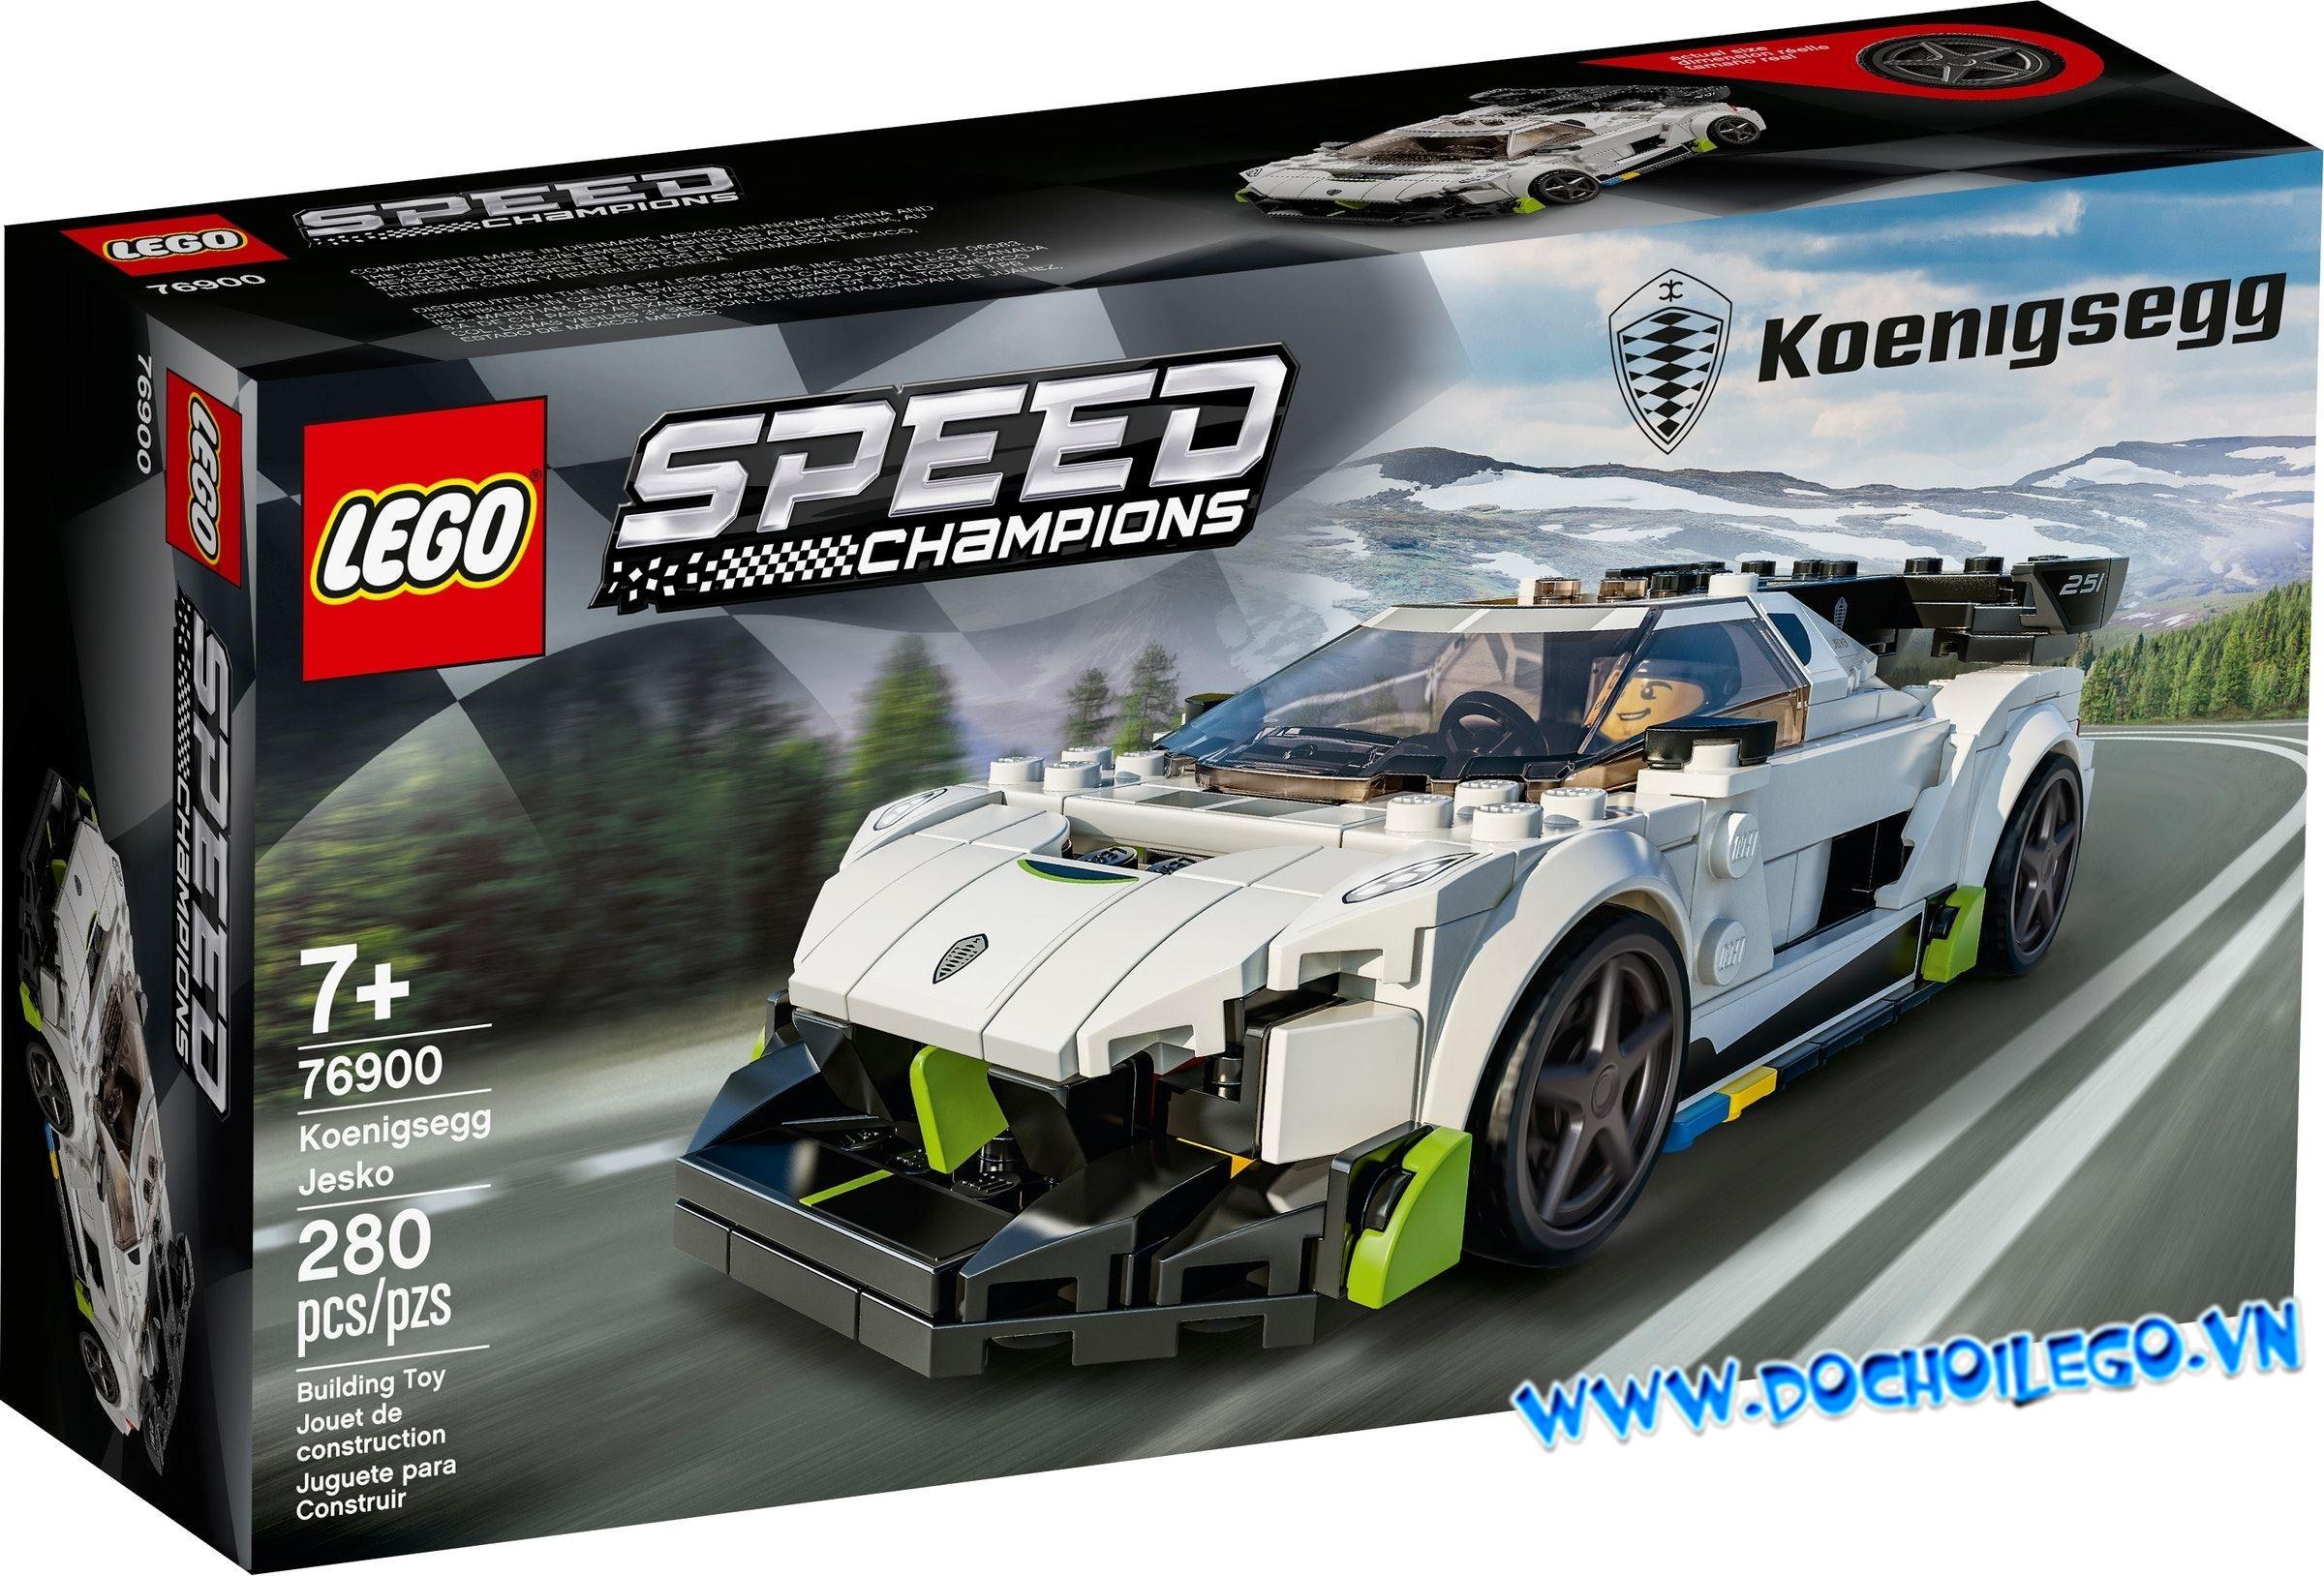 76900 LEGO Speed Champions Koenigsegg Jesko - Đồ chơi LEGO